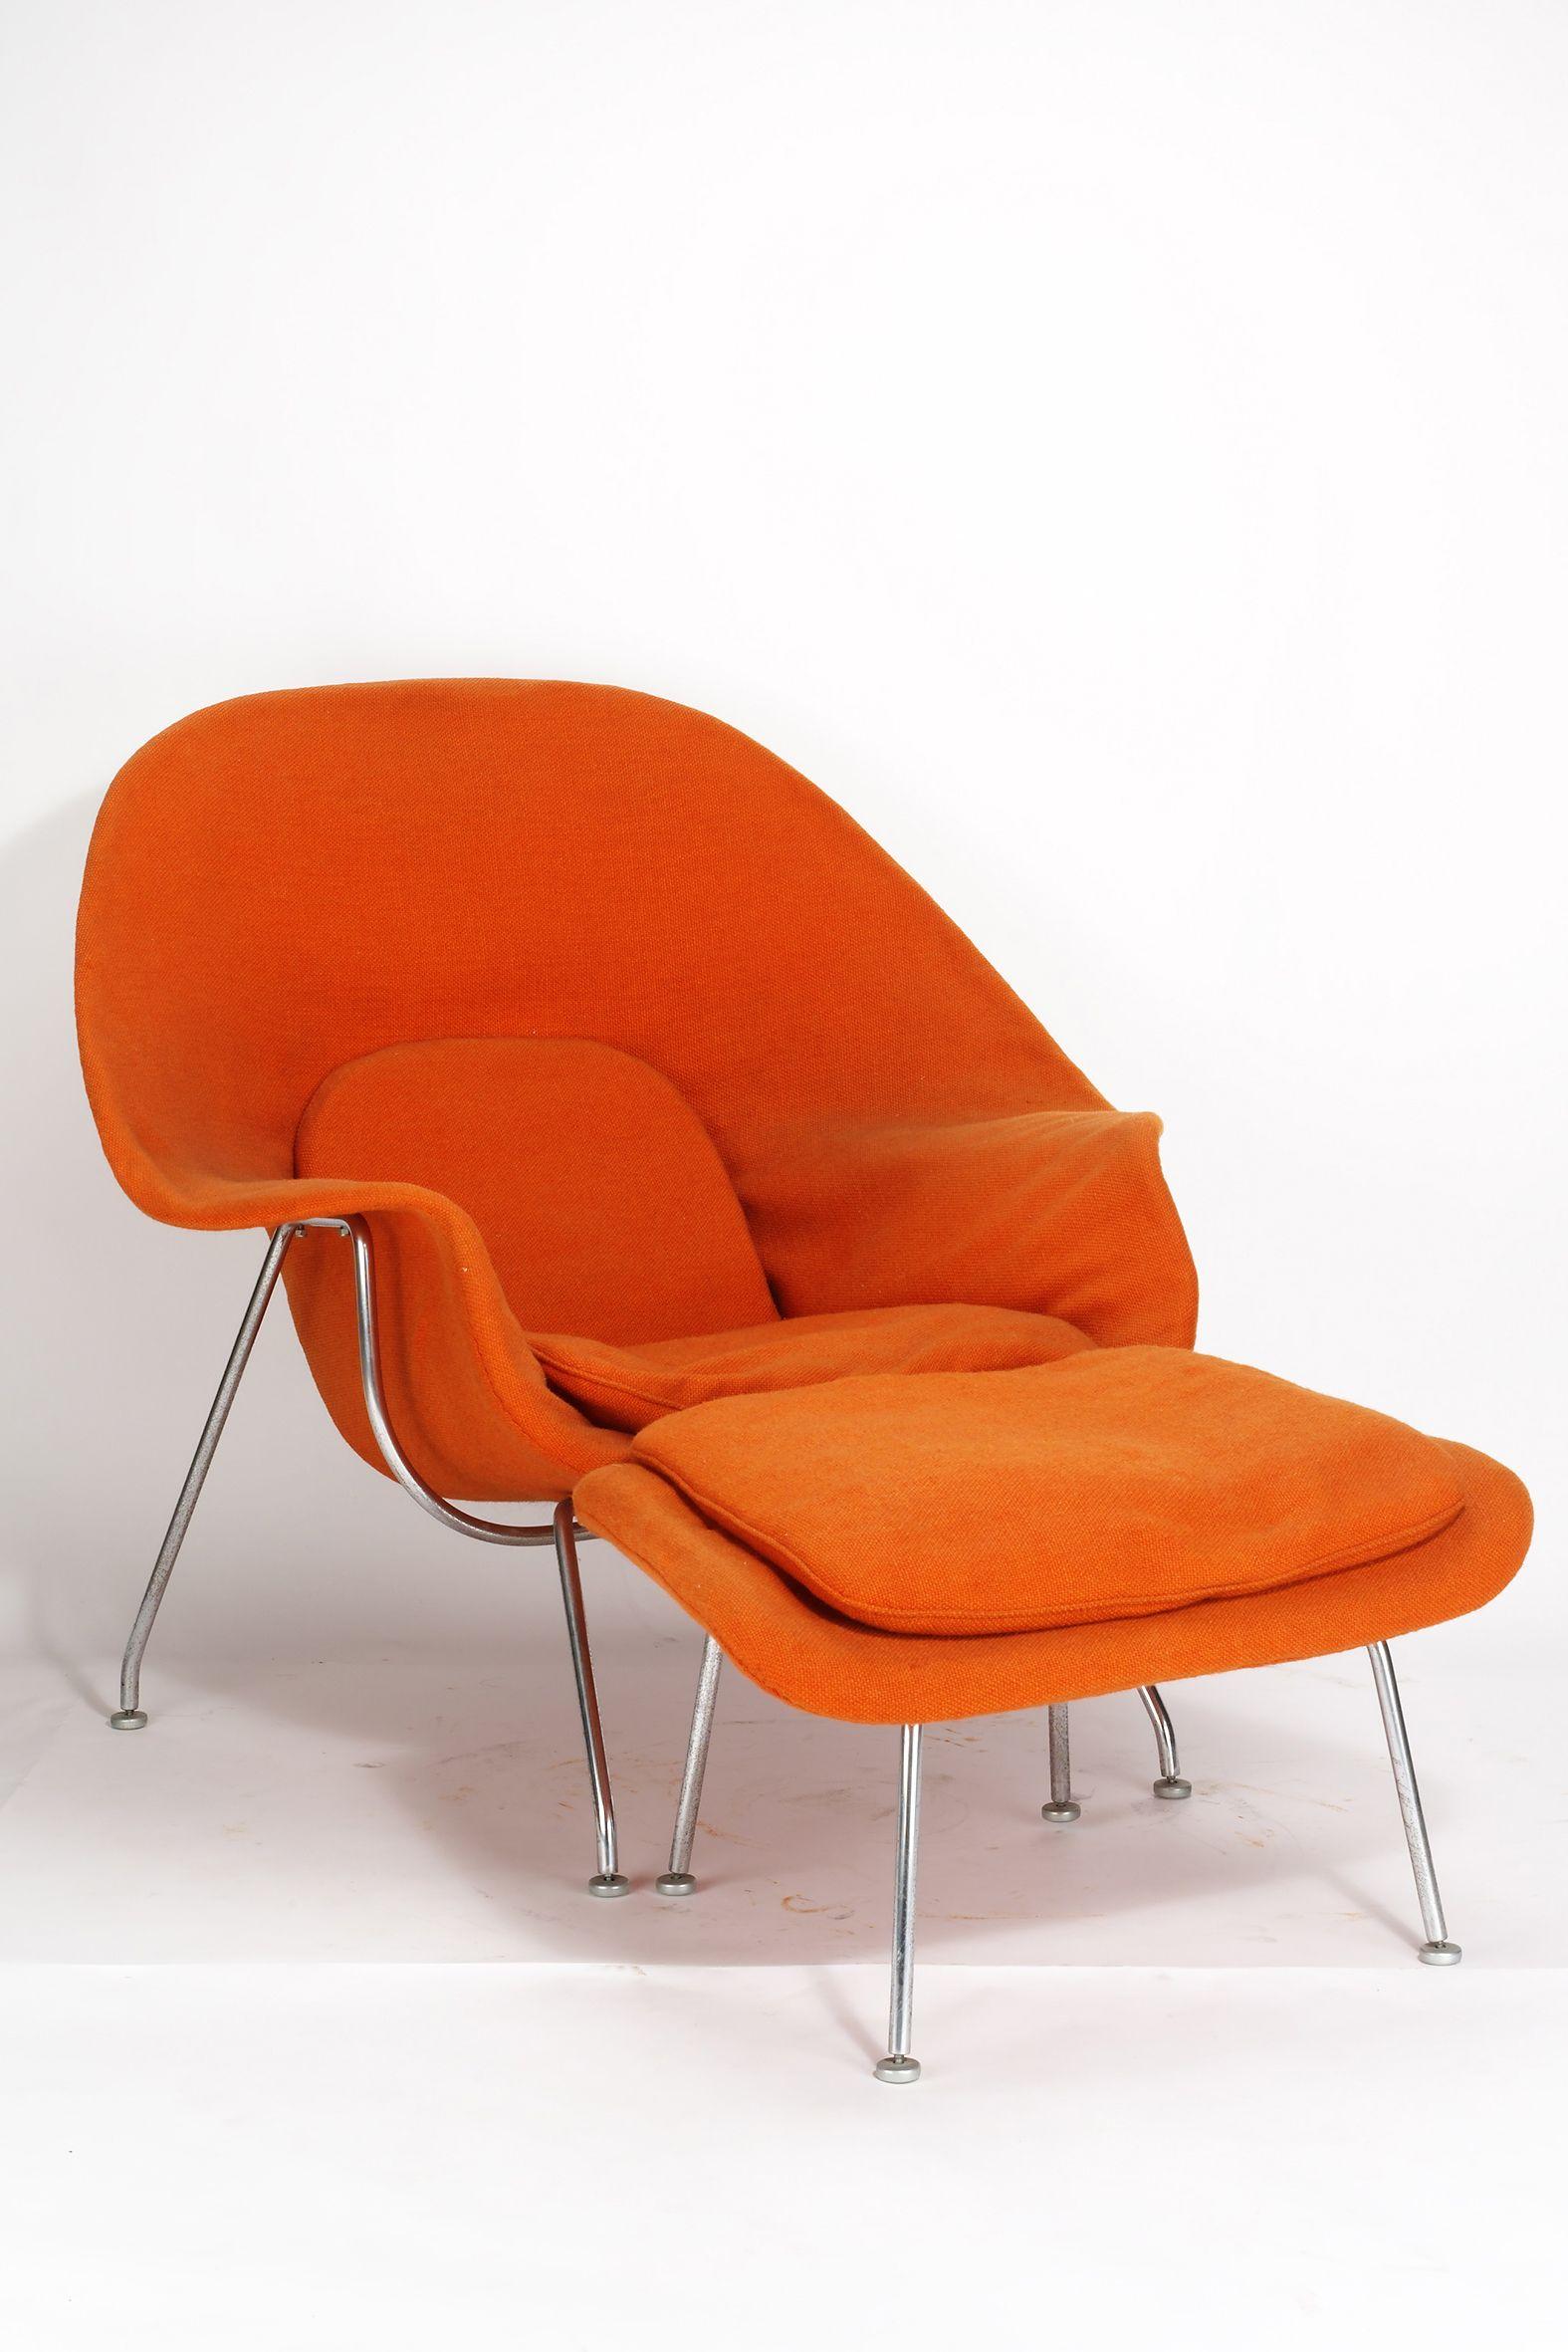 Eero Saarinen Womb Chair 1948 Scandinave Chaises Artistes Chaise Uterus